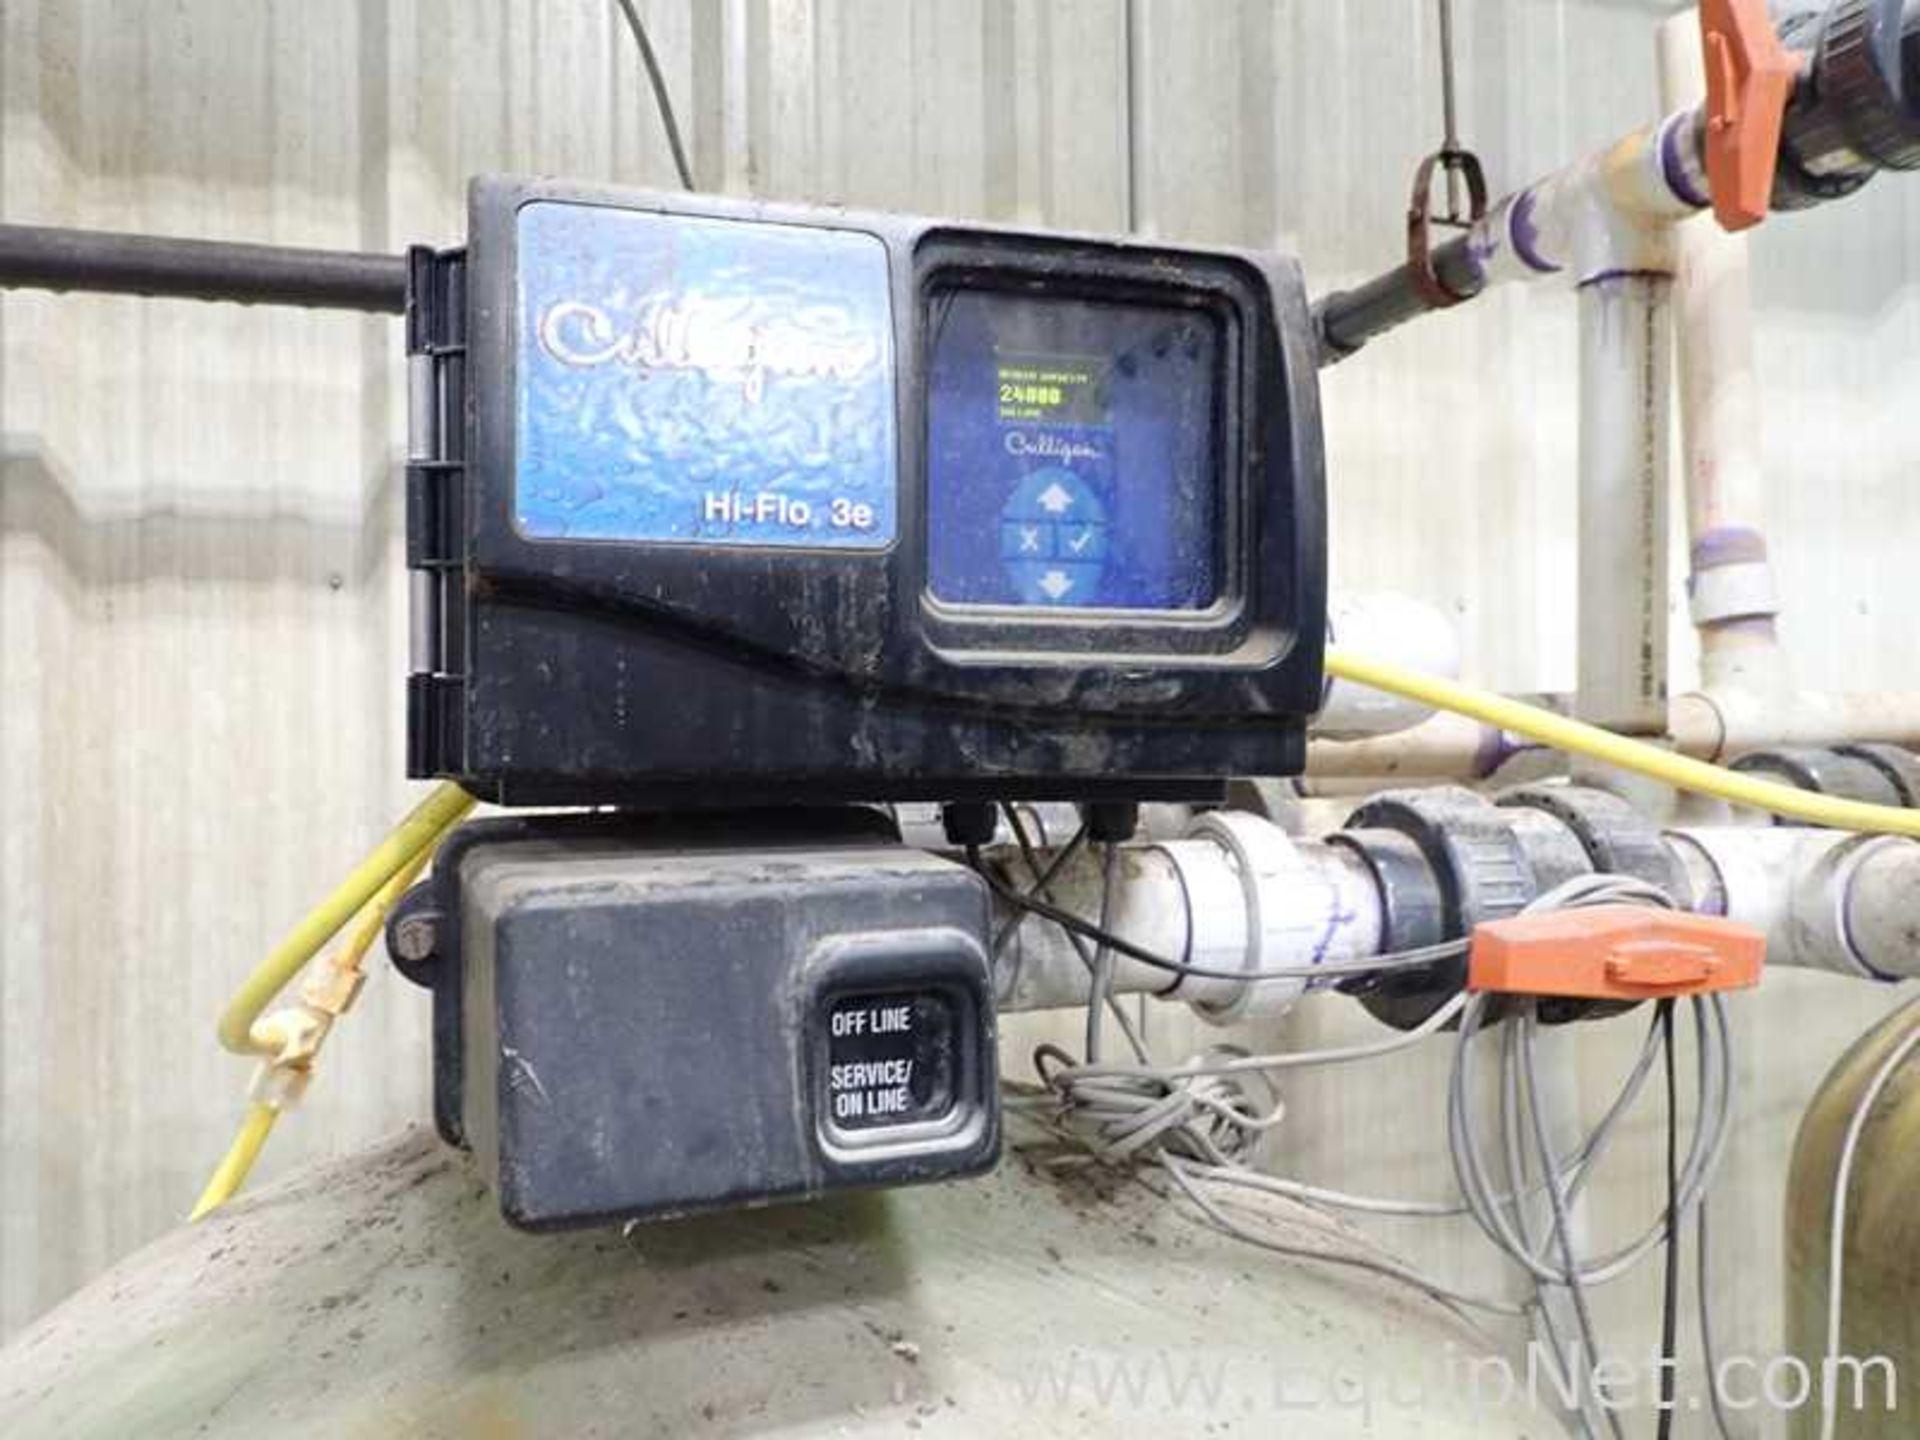 Culligan Hi-Flo 3e Water Softener System - Image 5 of 9